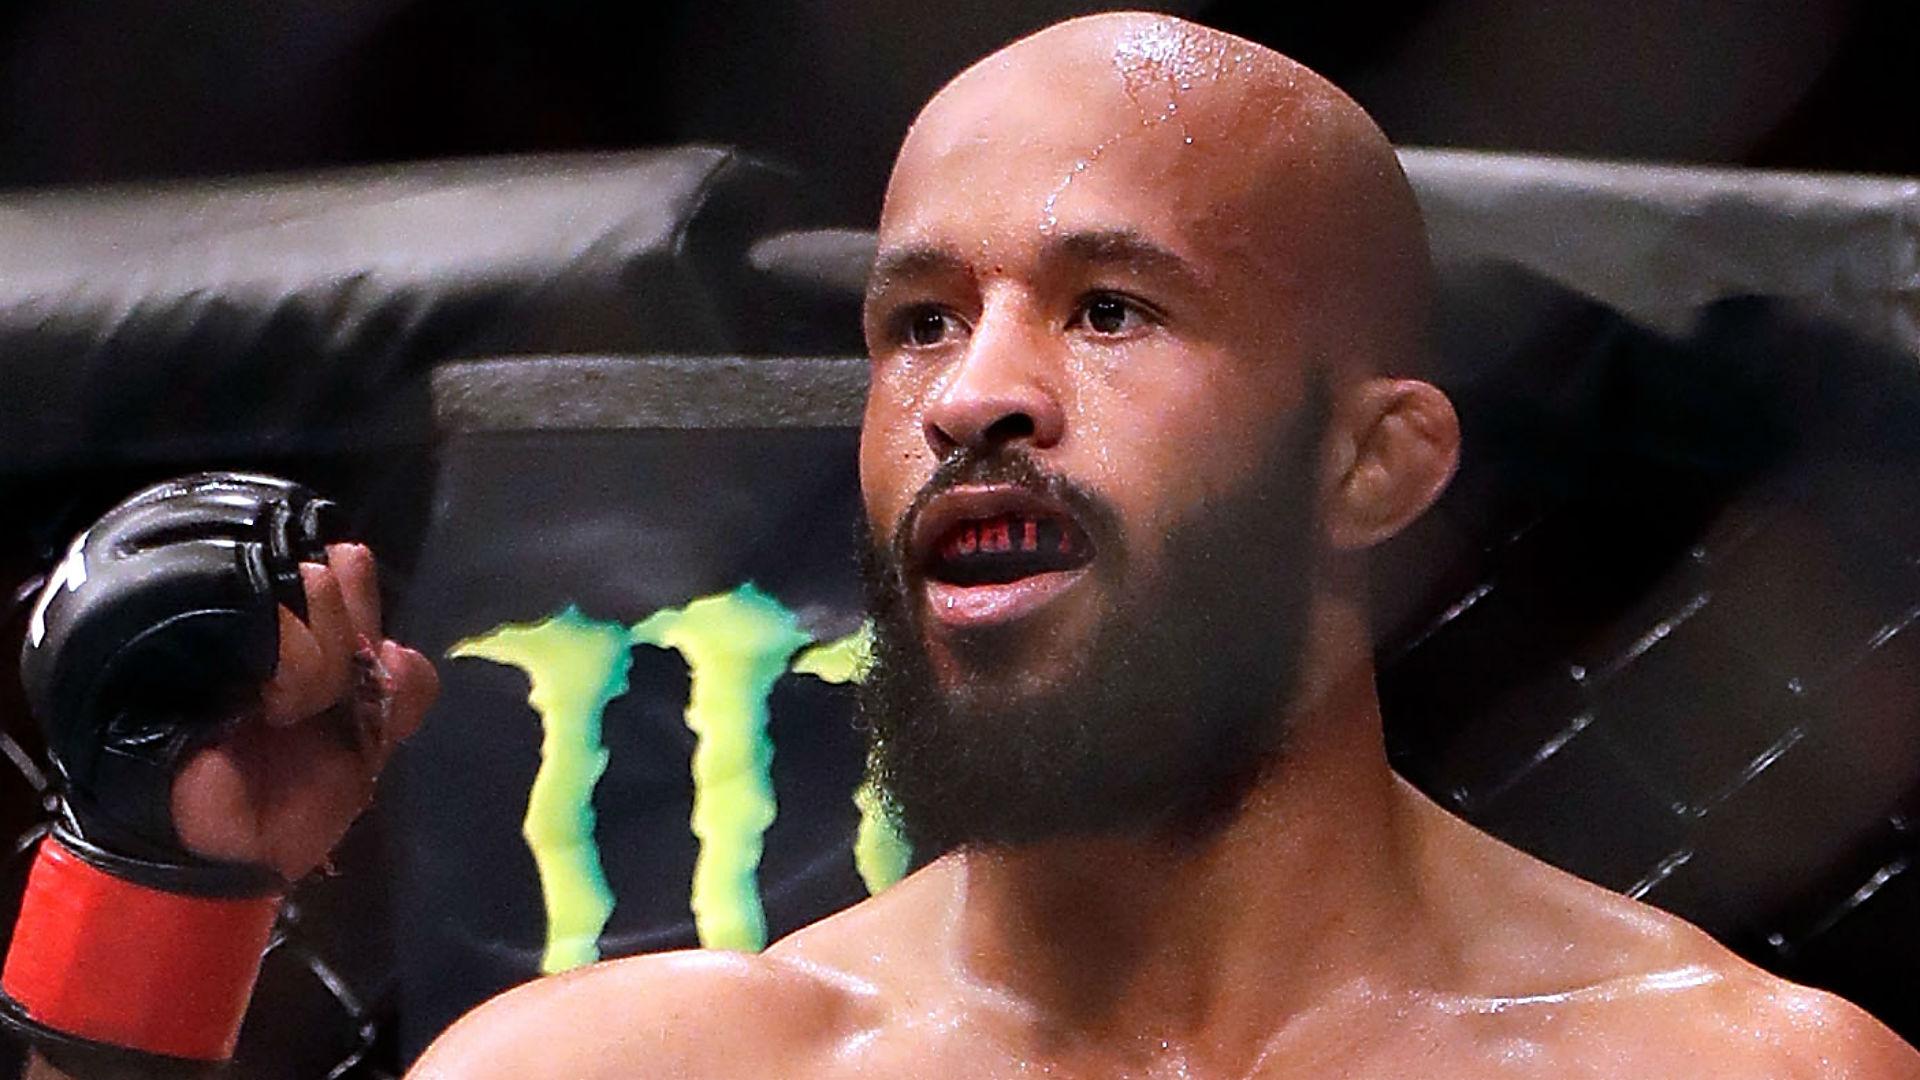 UFC 216: Ferguson vs. Lee, fight card, date, start time, PPV price